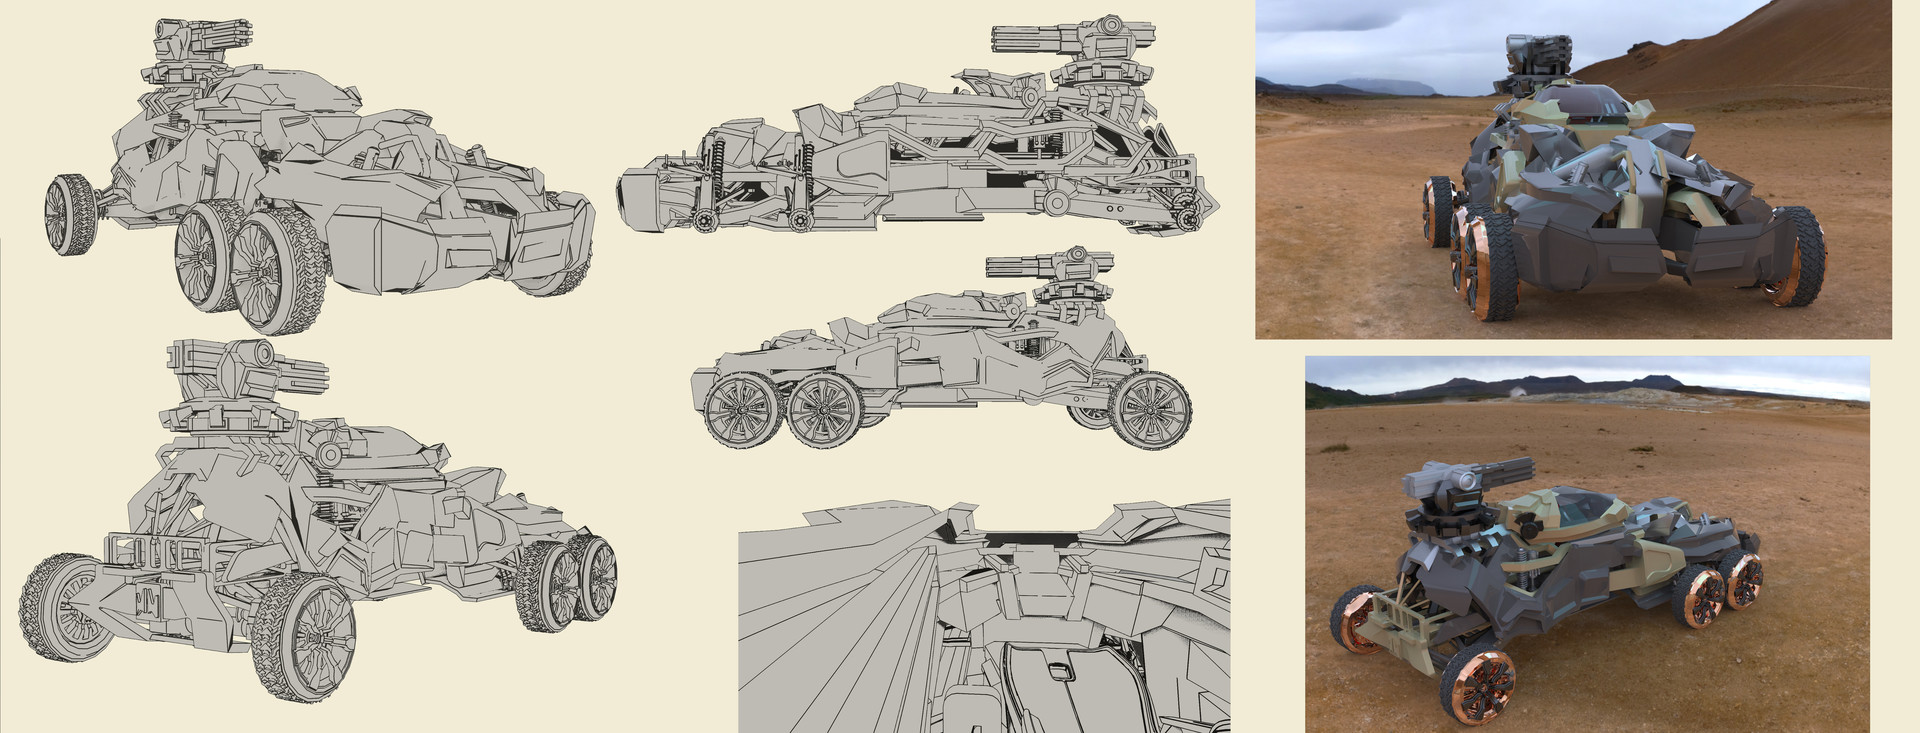 Wojciech bajor concept 1 mobile tank